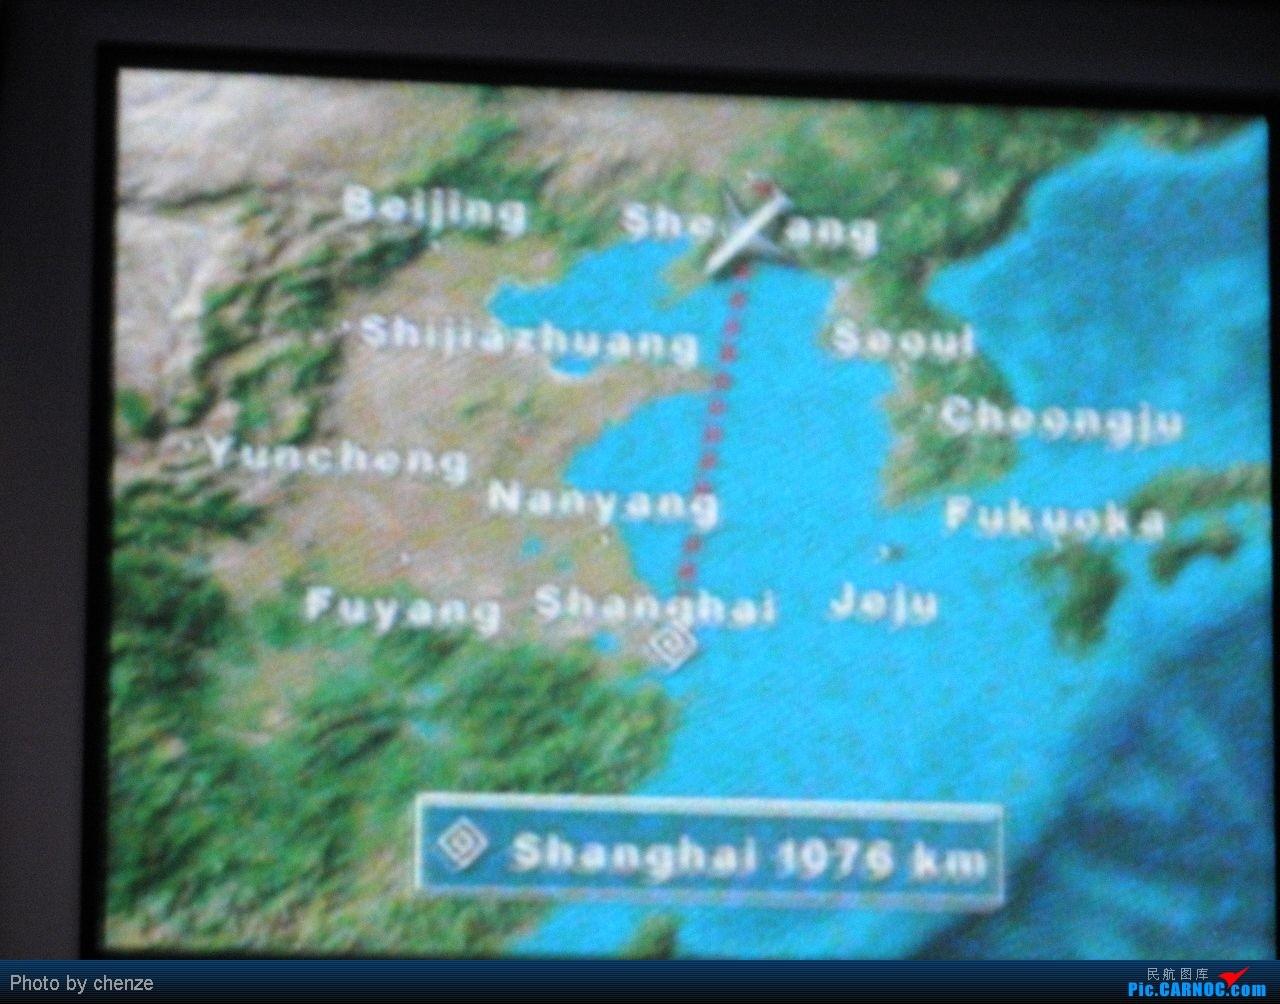 Re:[原创]春节回家探亲,奉上些烂图,笑纳!!PVG-SHE-PVG AIRBUS A330-300 B-6128